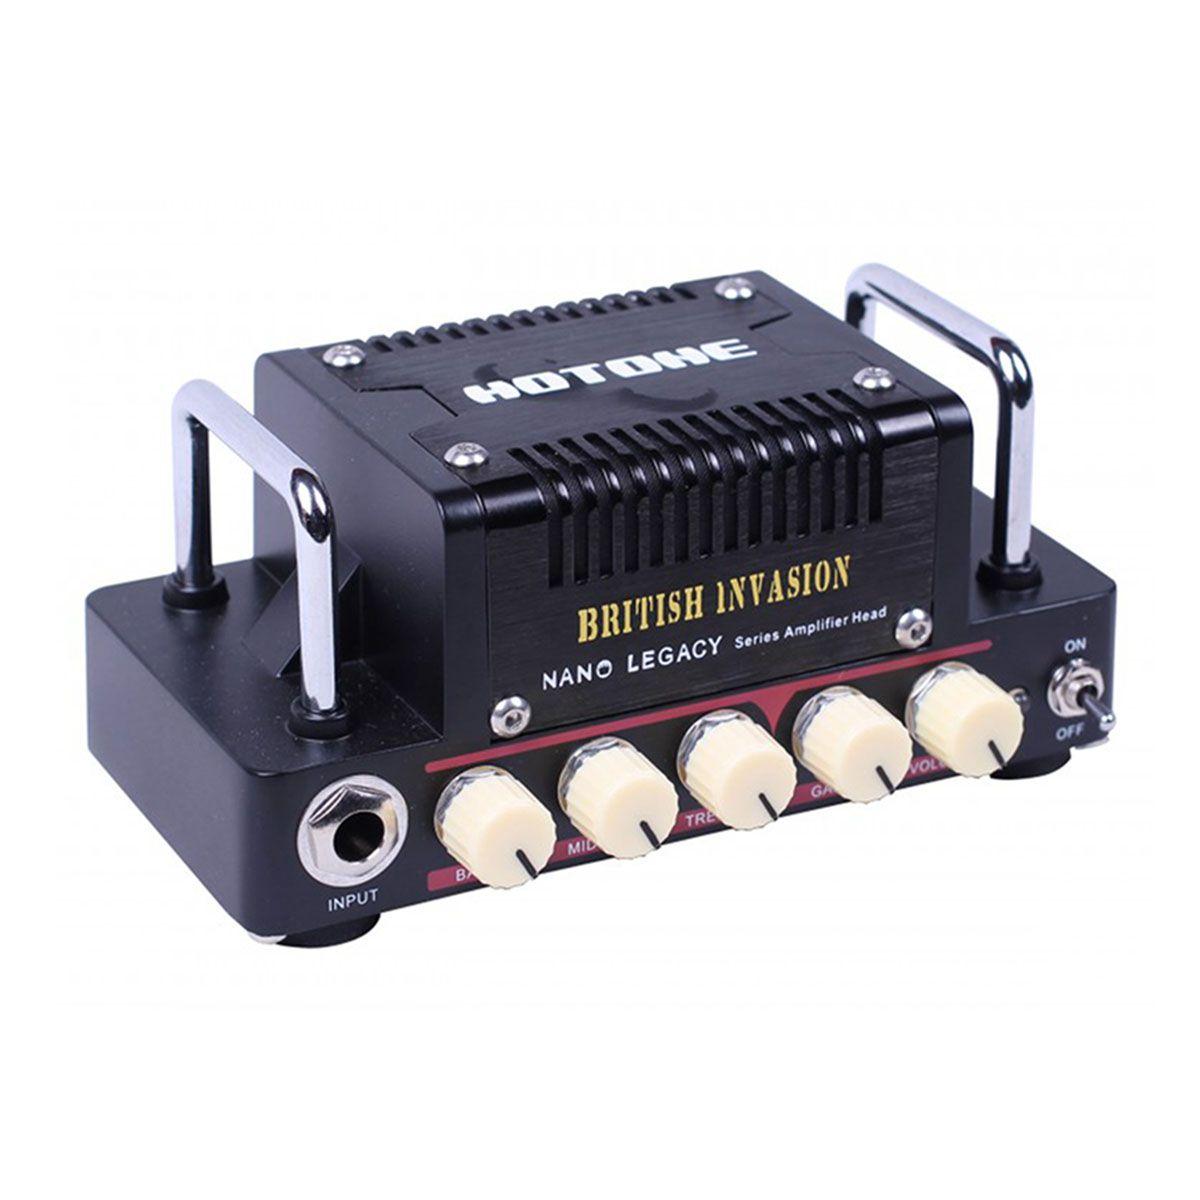 Mini Cabeçote Hotone Nano Legacy British Invasion NLA-1 5W